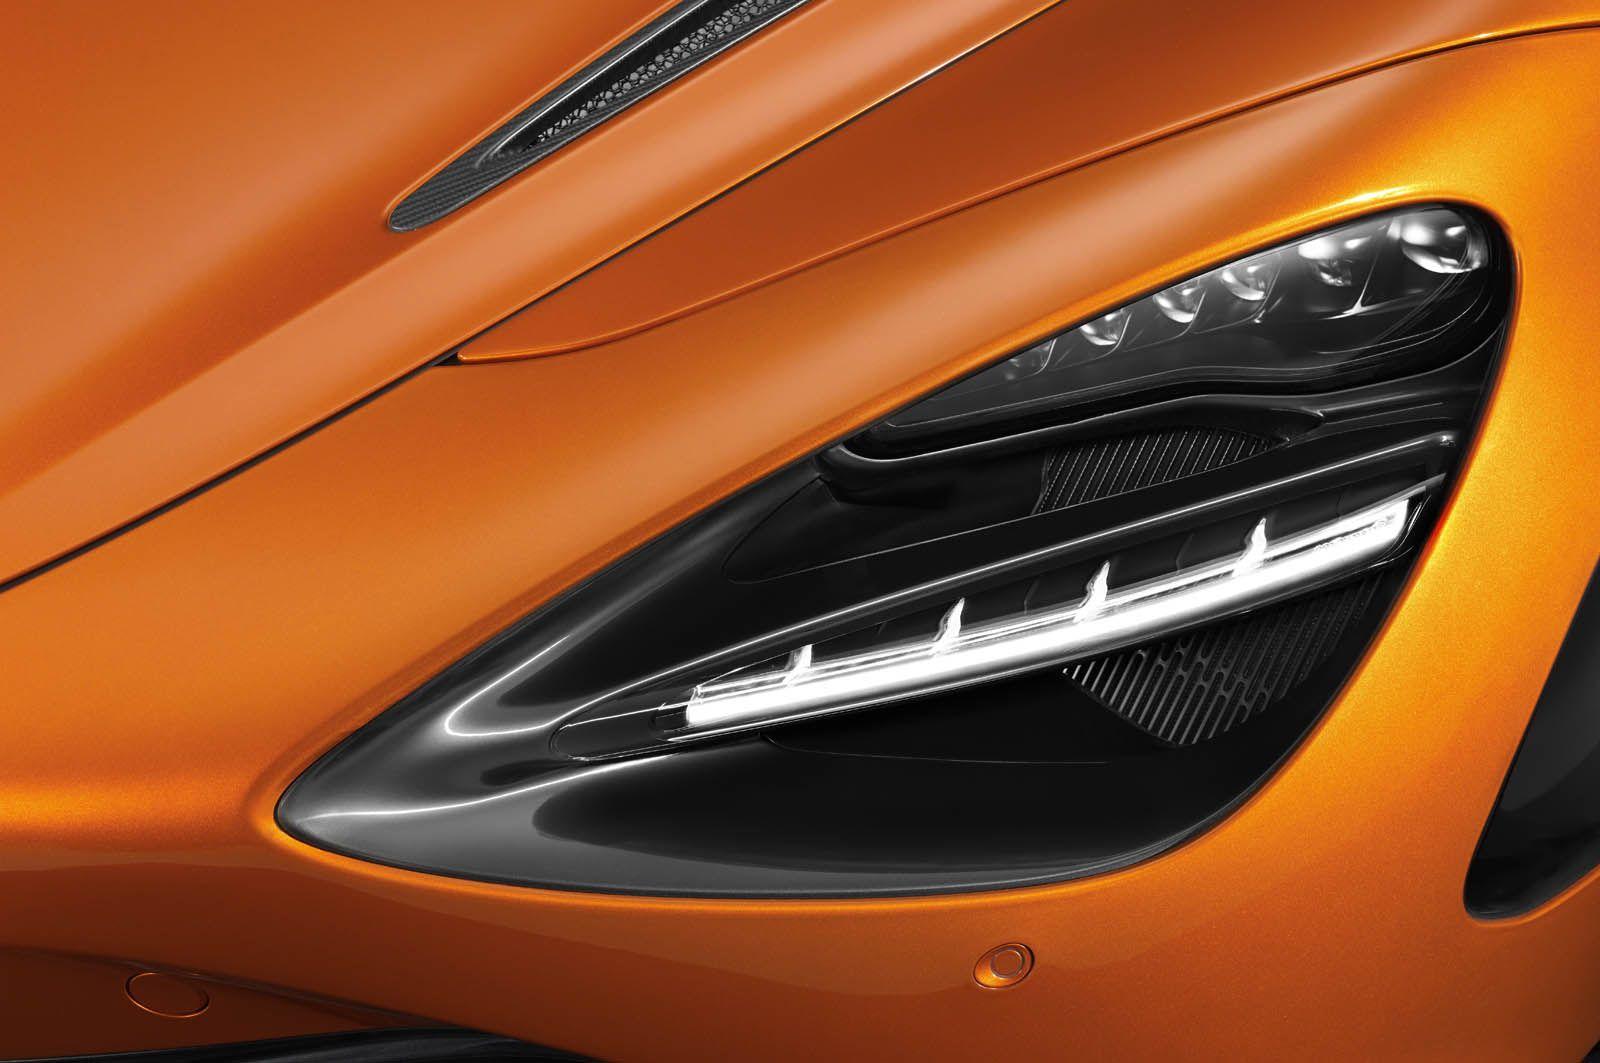 New Mclaren 720s Promises A Super Series Sequel Even Better Than The Original Carscoops New Mclaren Mclaren Supercar Design